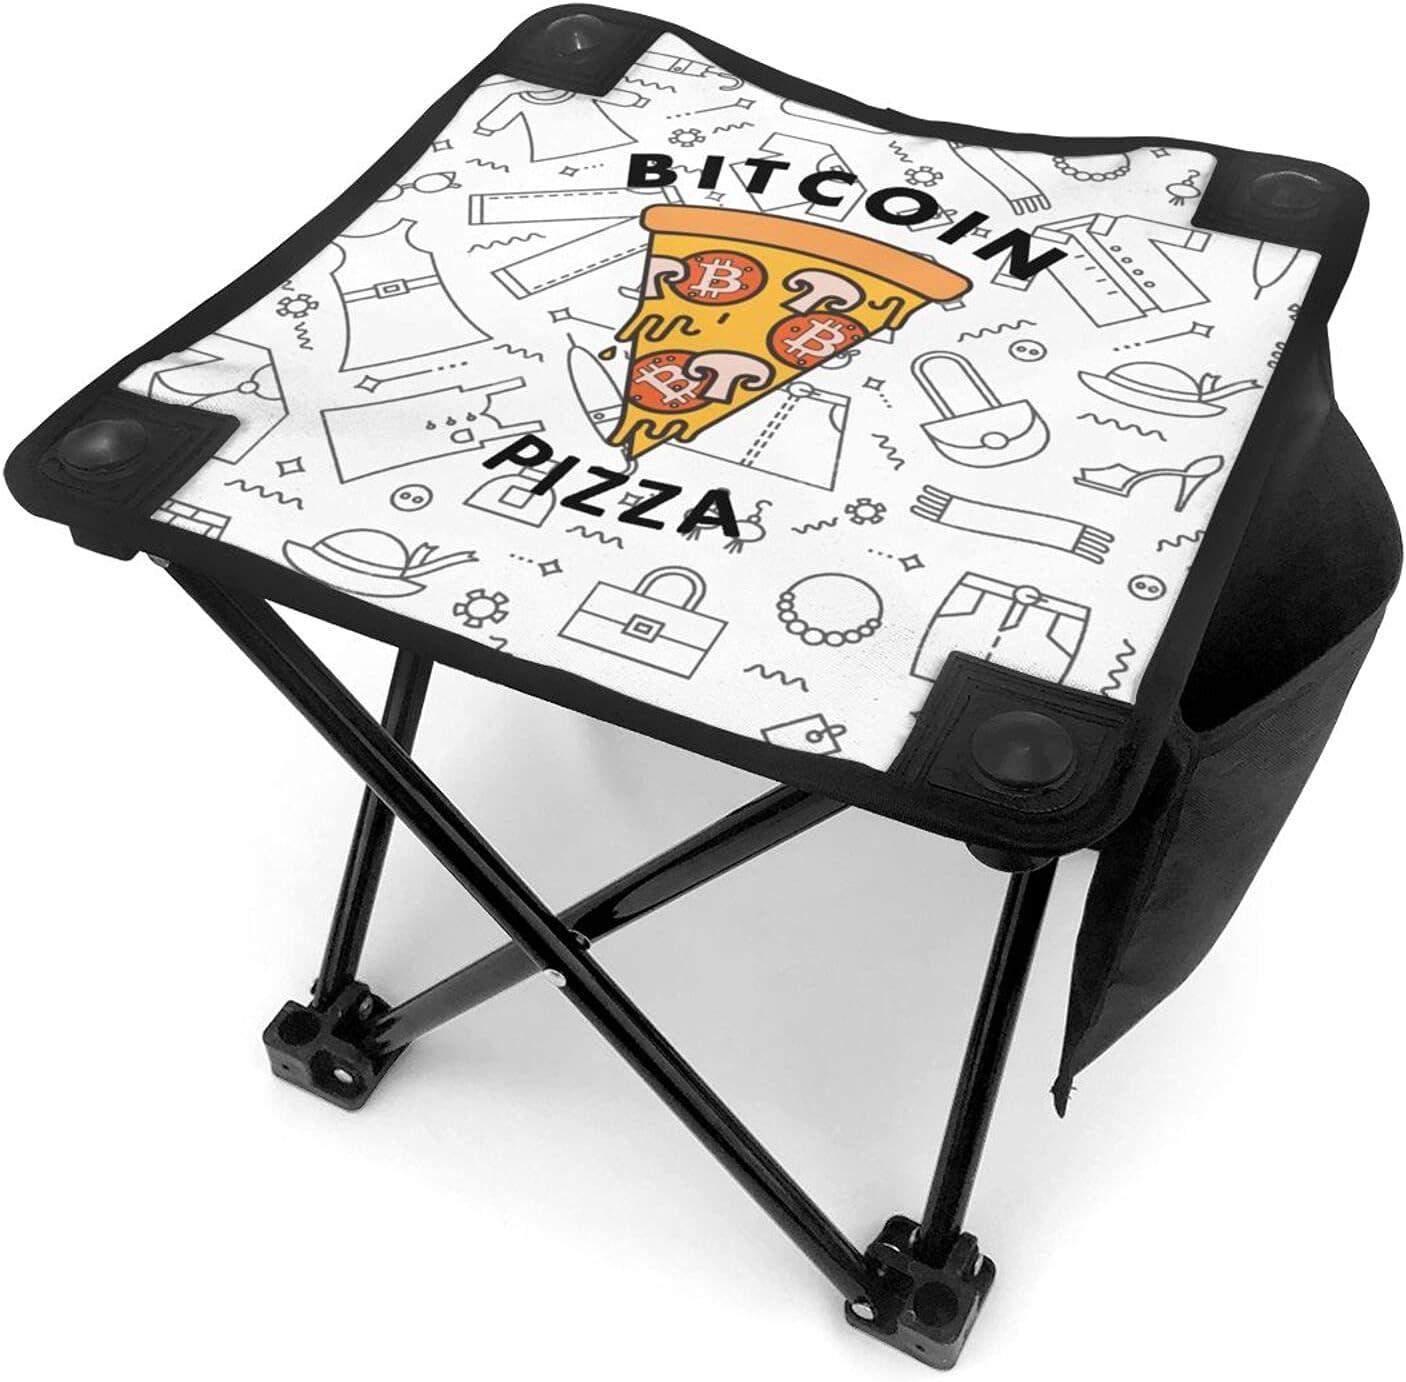 Pizza Cheap bargain Bitcoin Nippon regular agency Camping Stool Ultralight Fold Mini Portable Stools